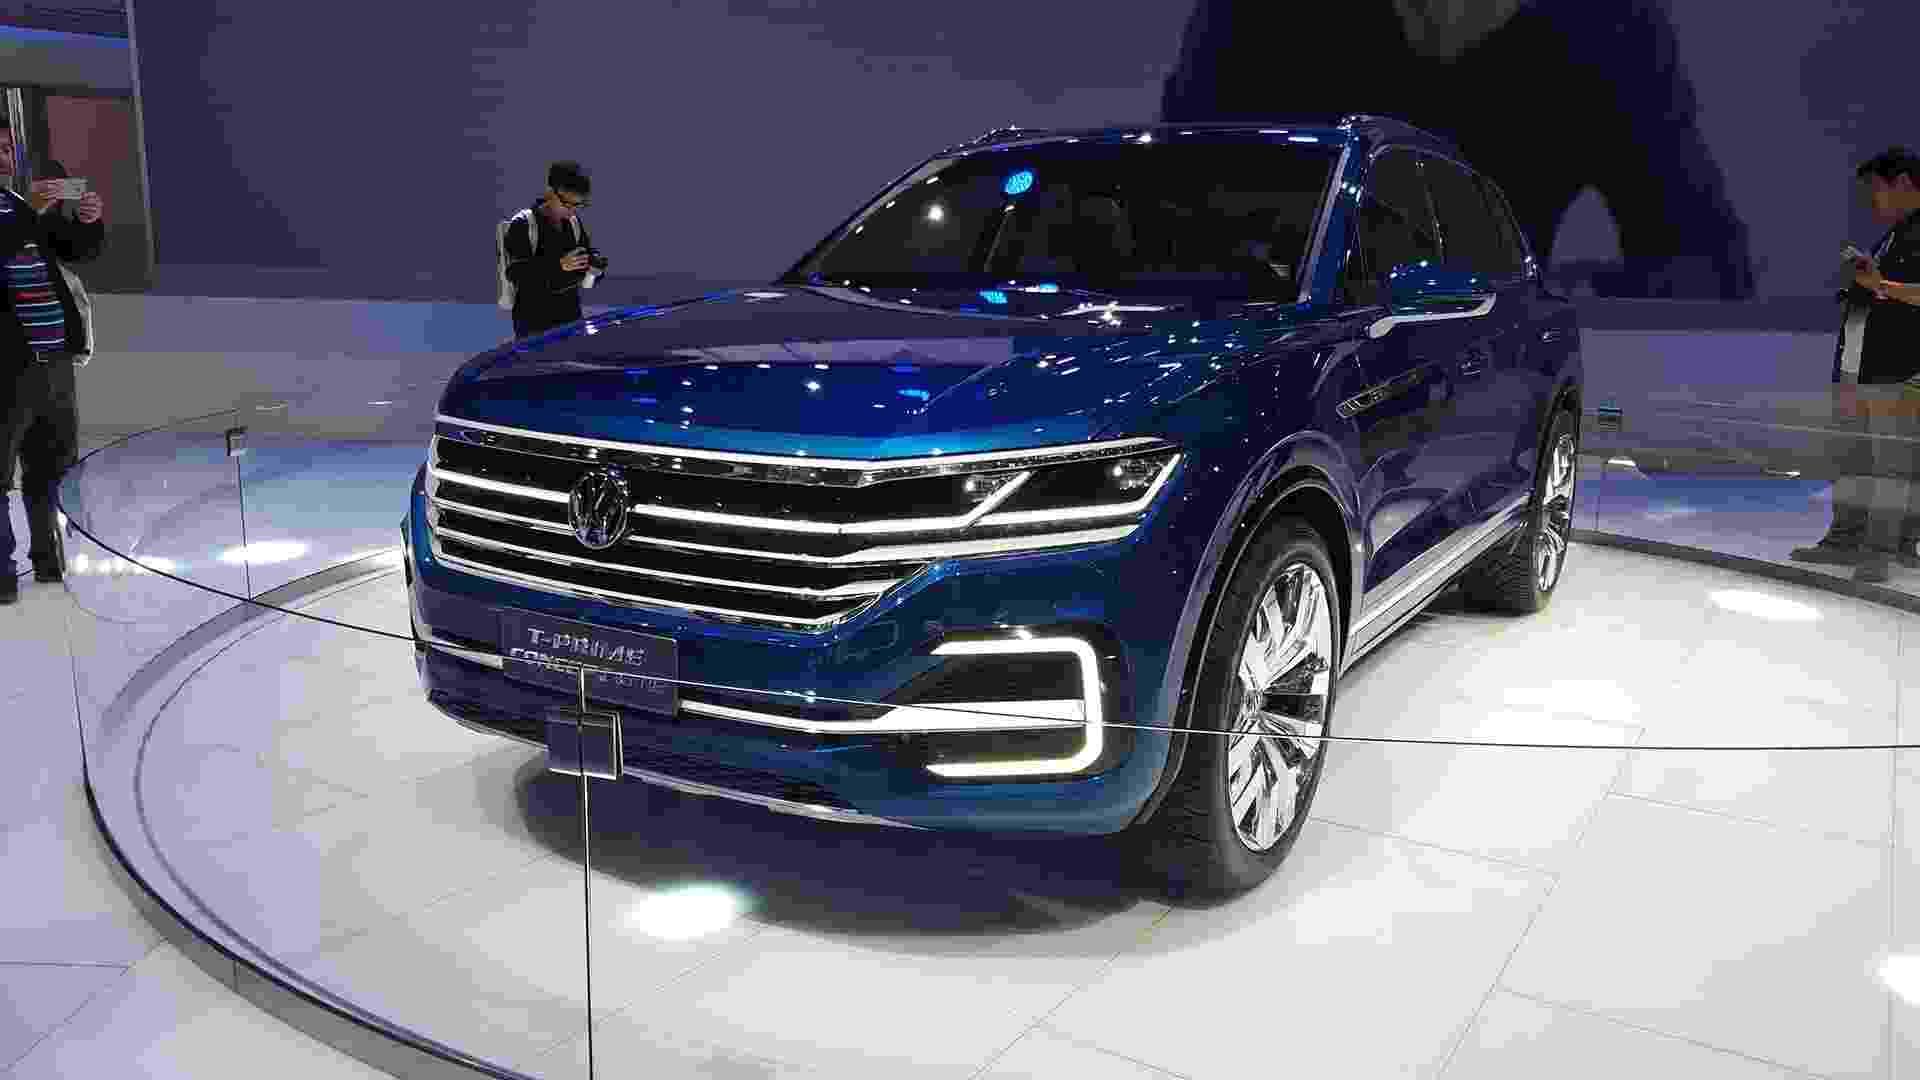 Volkswagen T-Prime Concept - Leonardo Felix/UOL